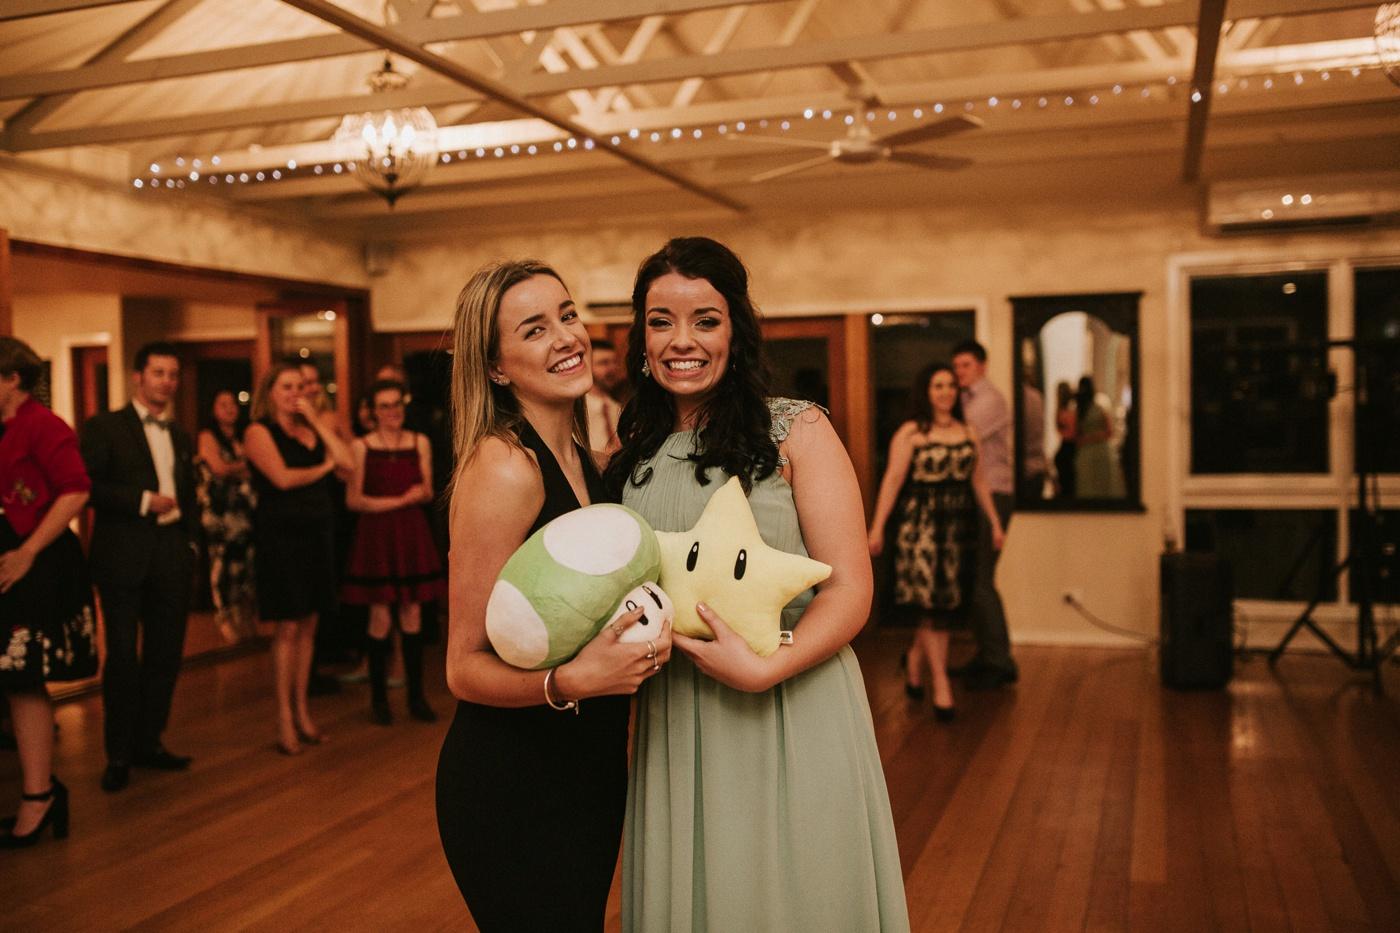 Emma&Morgan_Melbourne-Vintage-Elegant-Fun-Quirky-Yarra-Valley-Vineyard-Wedding_Melbourne-Wedding-Photography-111